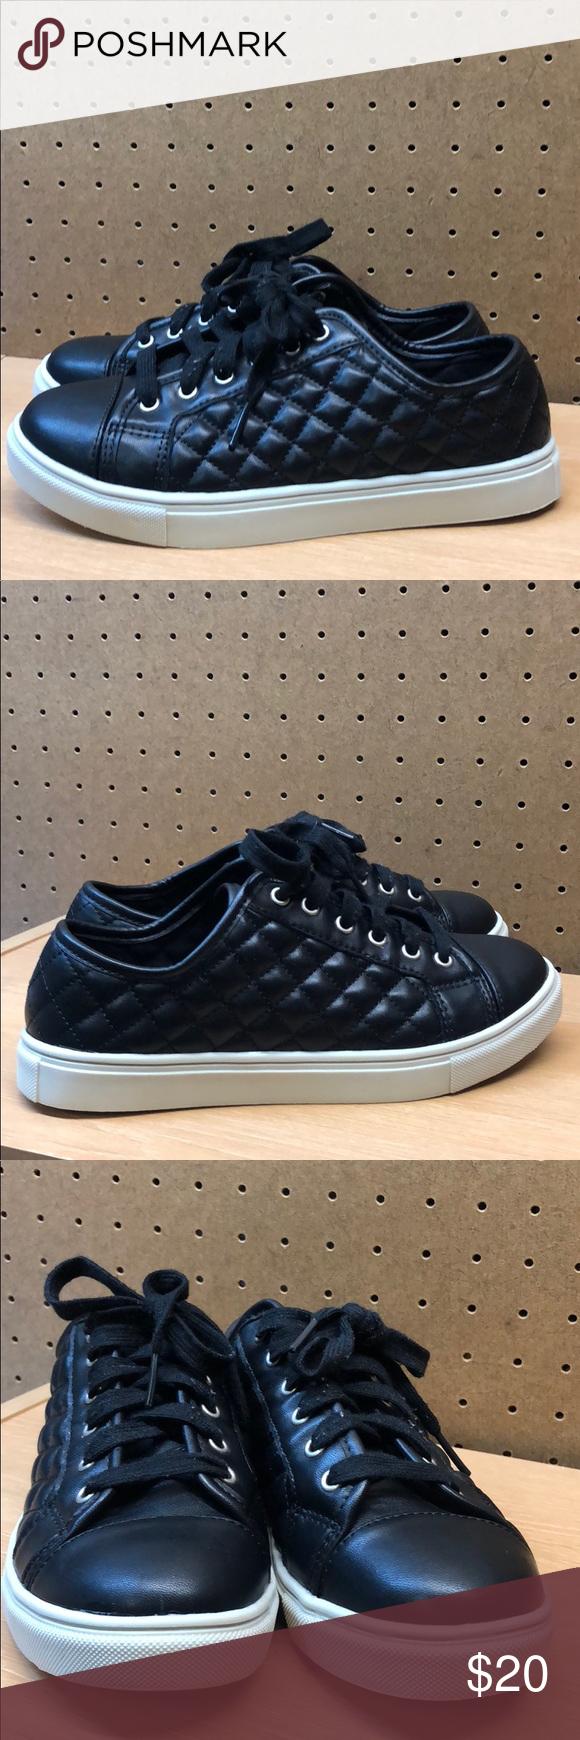 4721a72279f Madden Girl Evettee Women s Sneakers sz 7 M